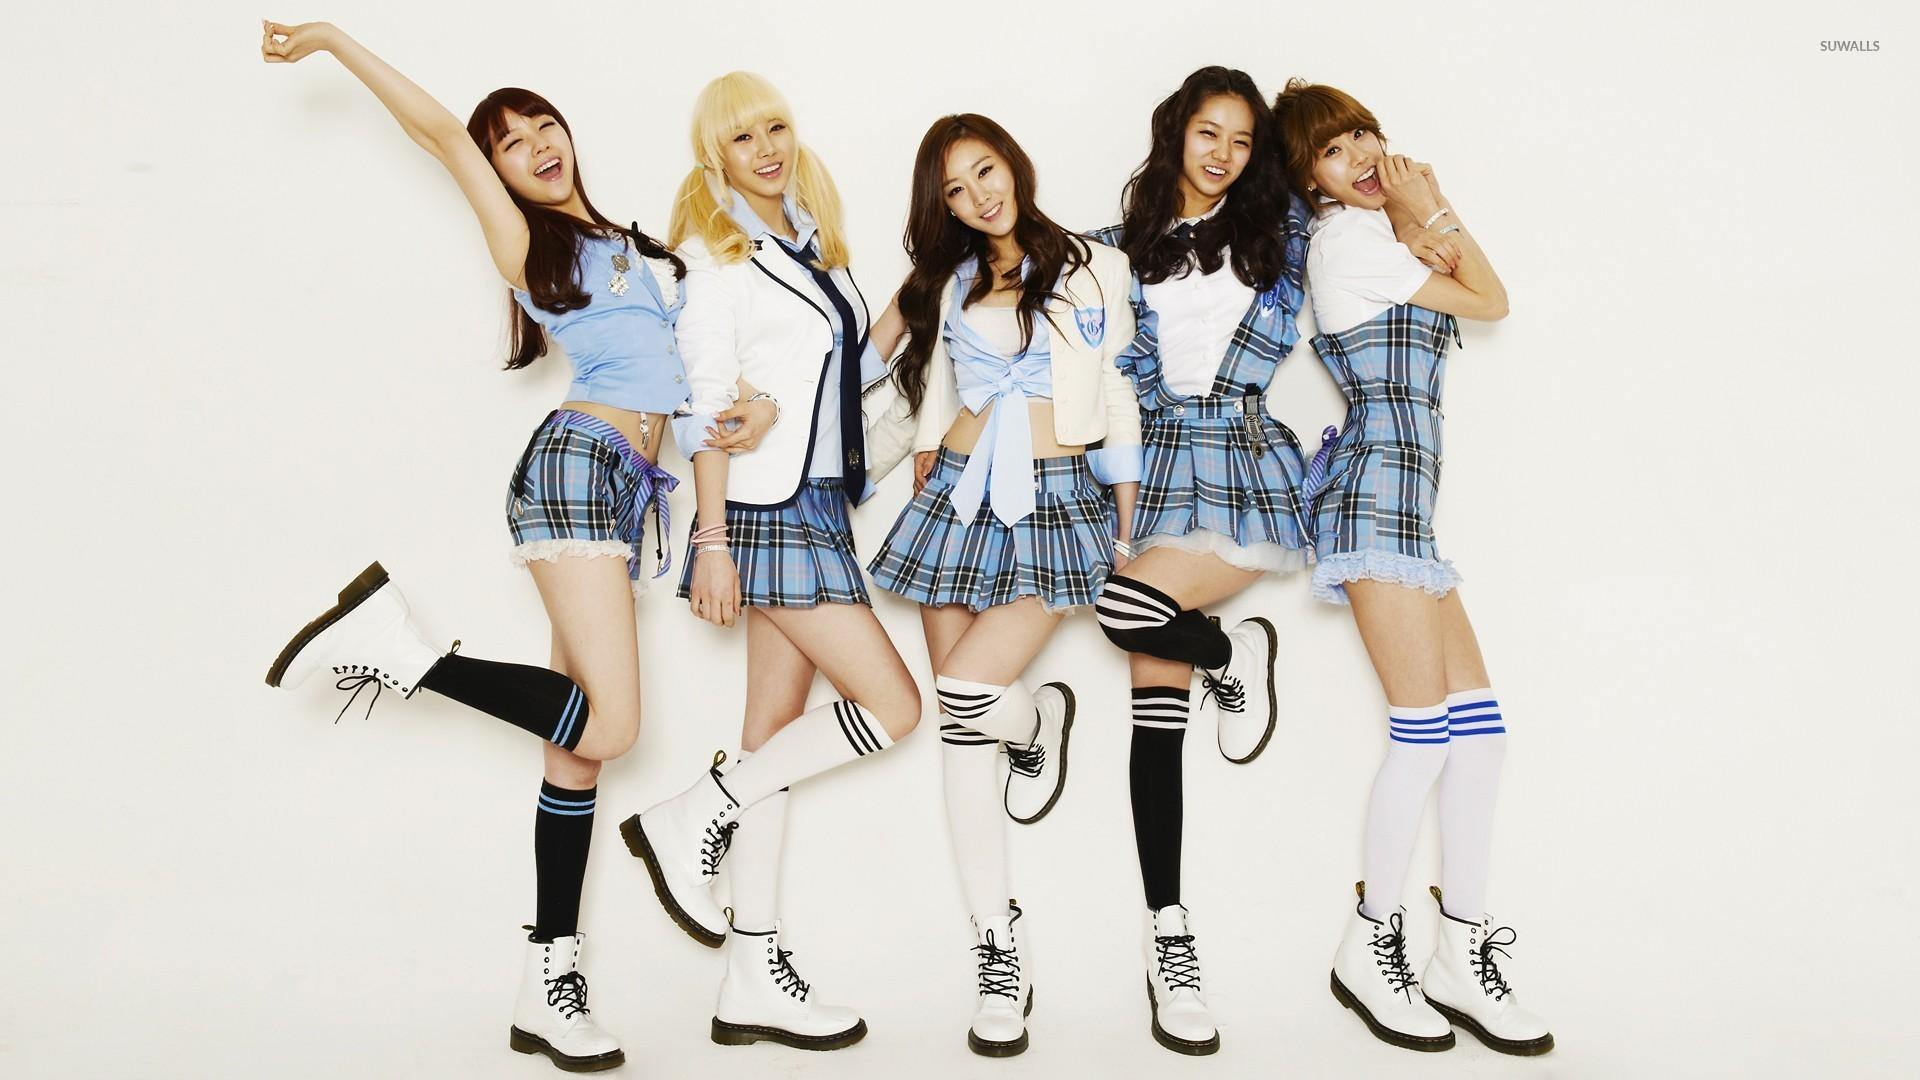 girl's day dressed as schoolgirls wallpaper - celebrity wallpapers